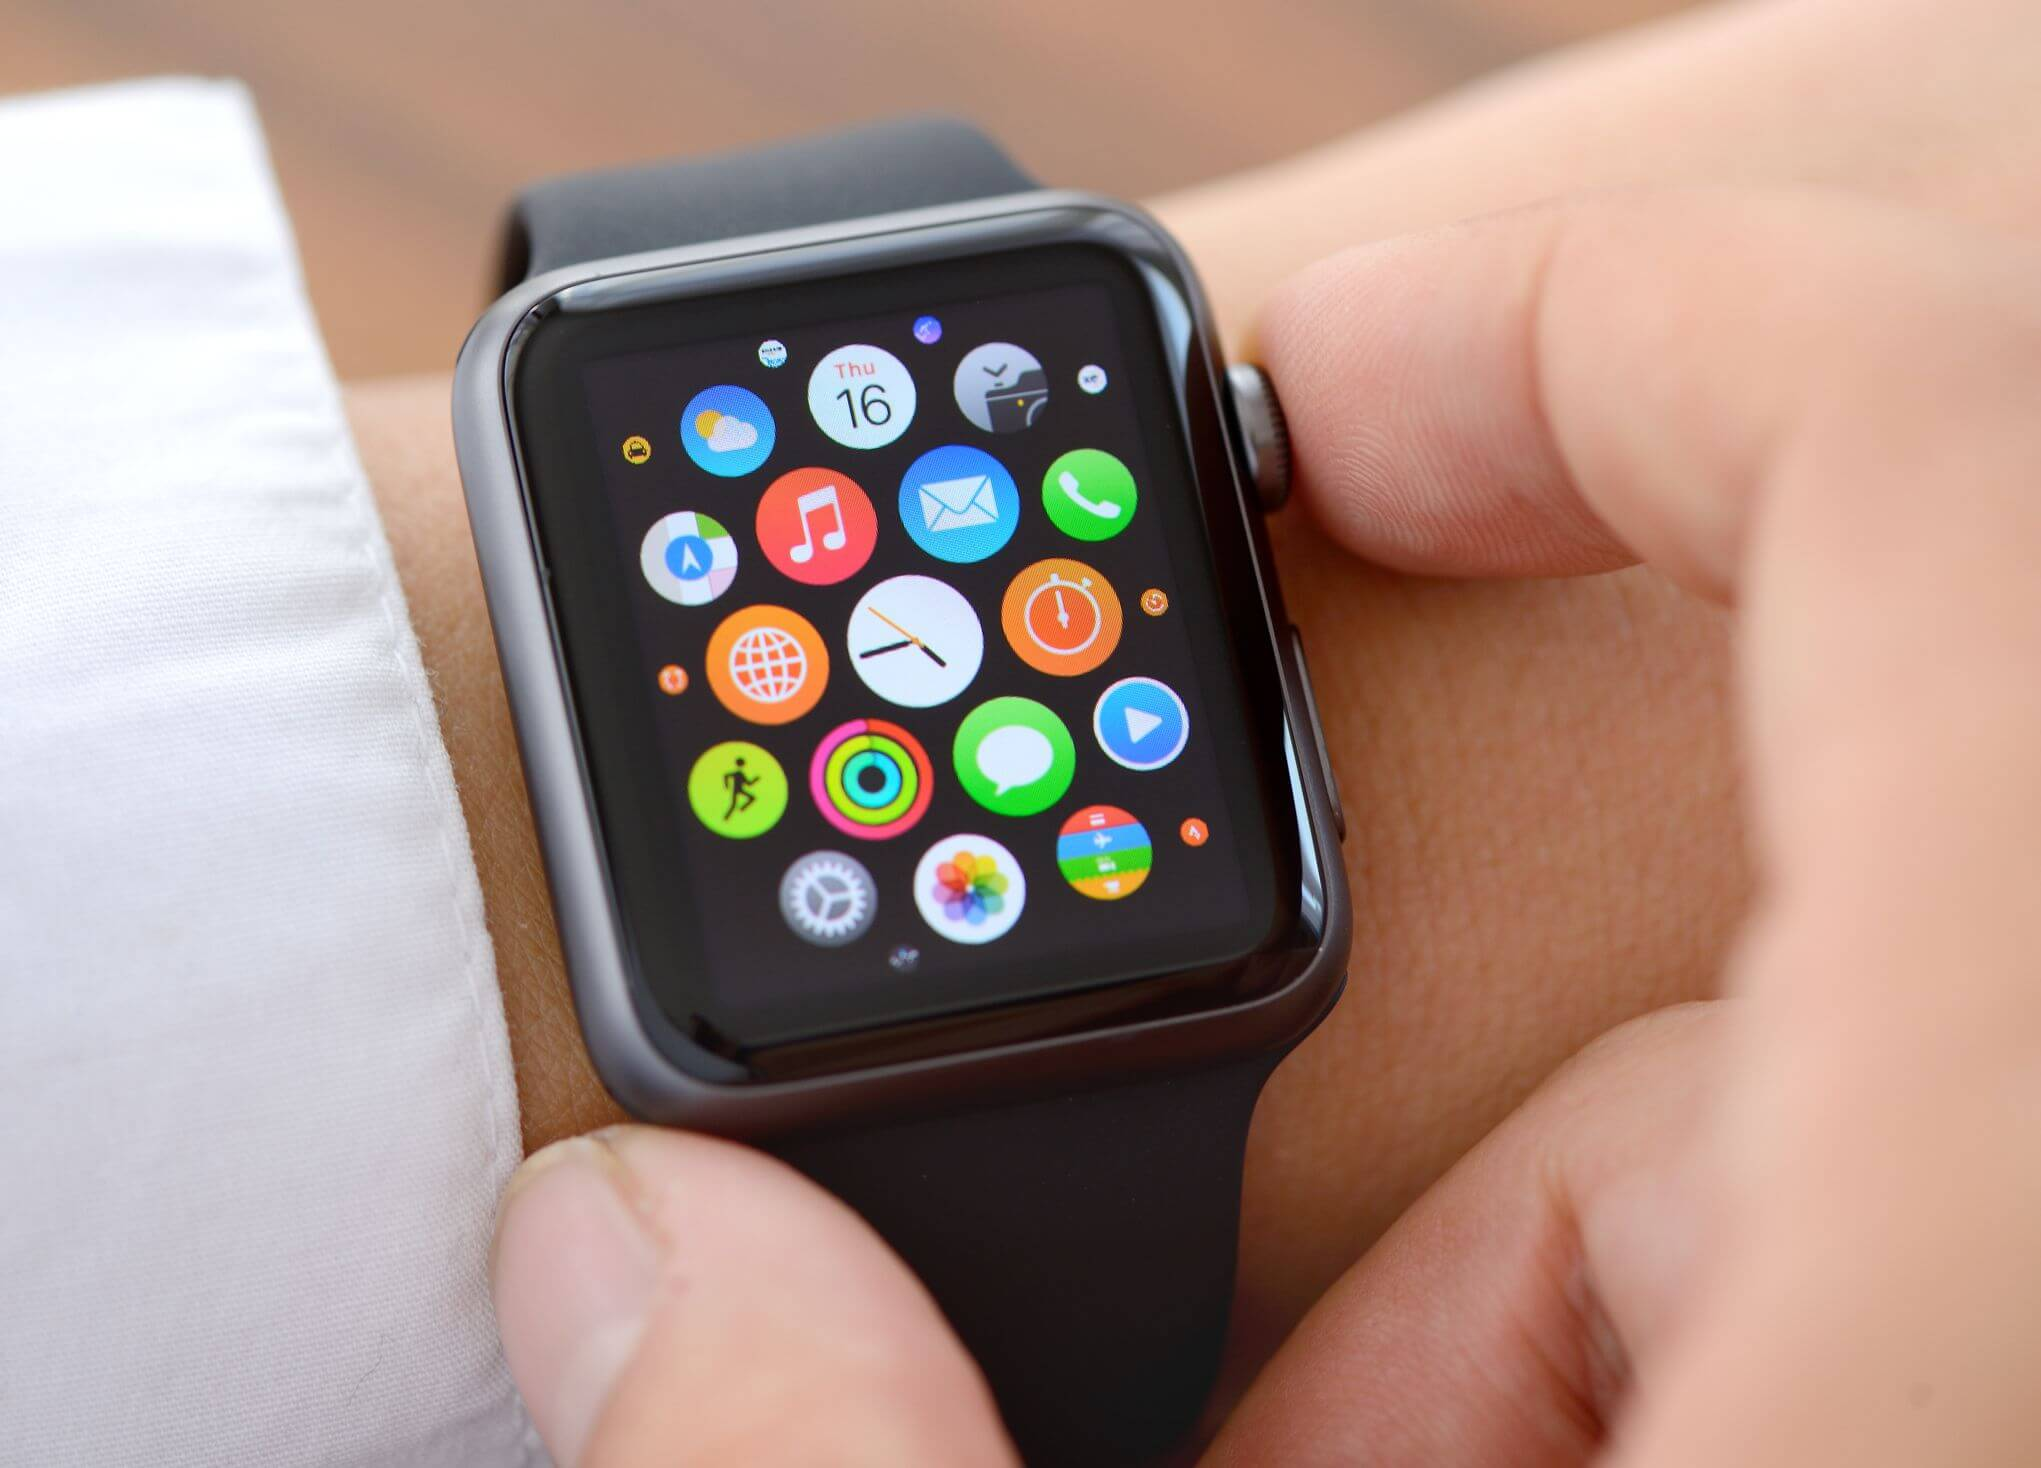 Eavesdropping Apple Watch